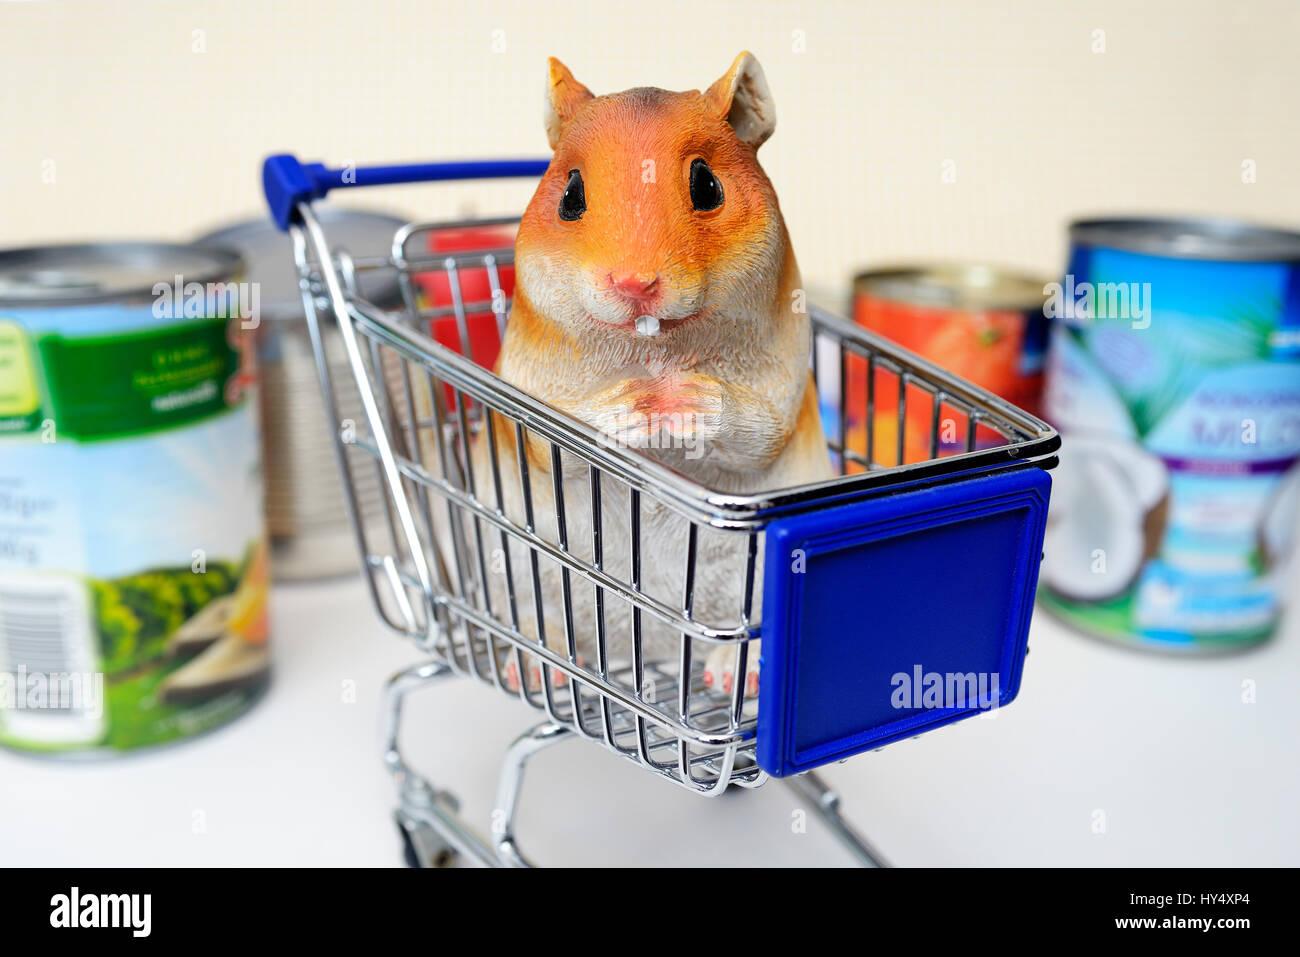 Hamster's figure in the shopping cart, symbolic photo hamster's purchases, Hamsterfigur im Einkaufswagen, Symbolfoto Hamsterkaeufe Stock Photo